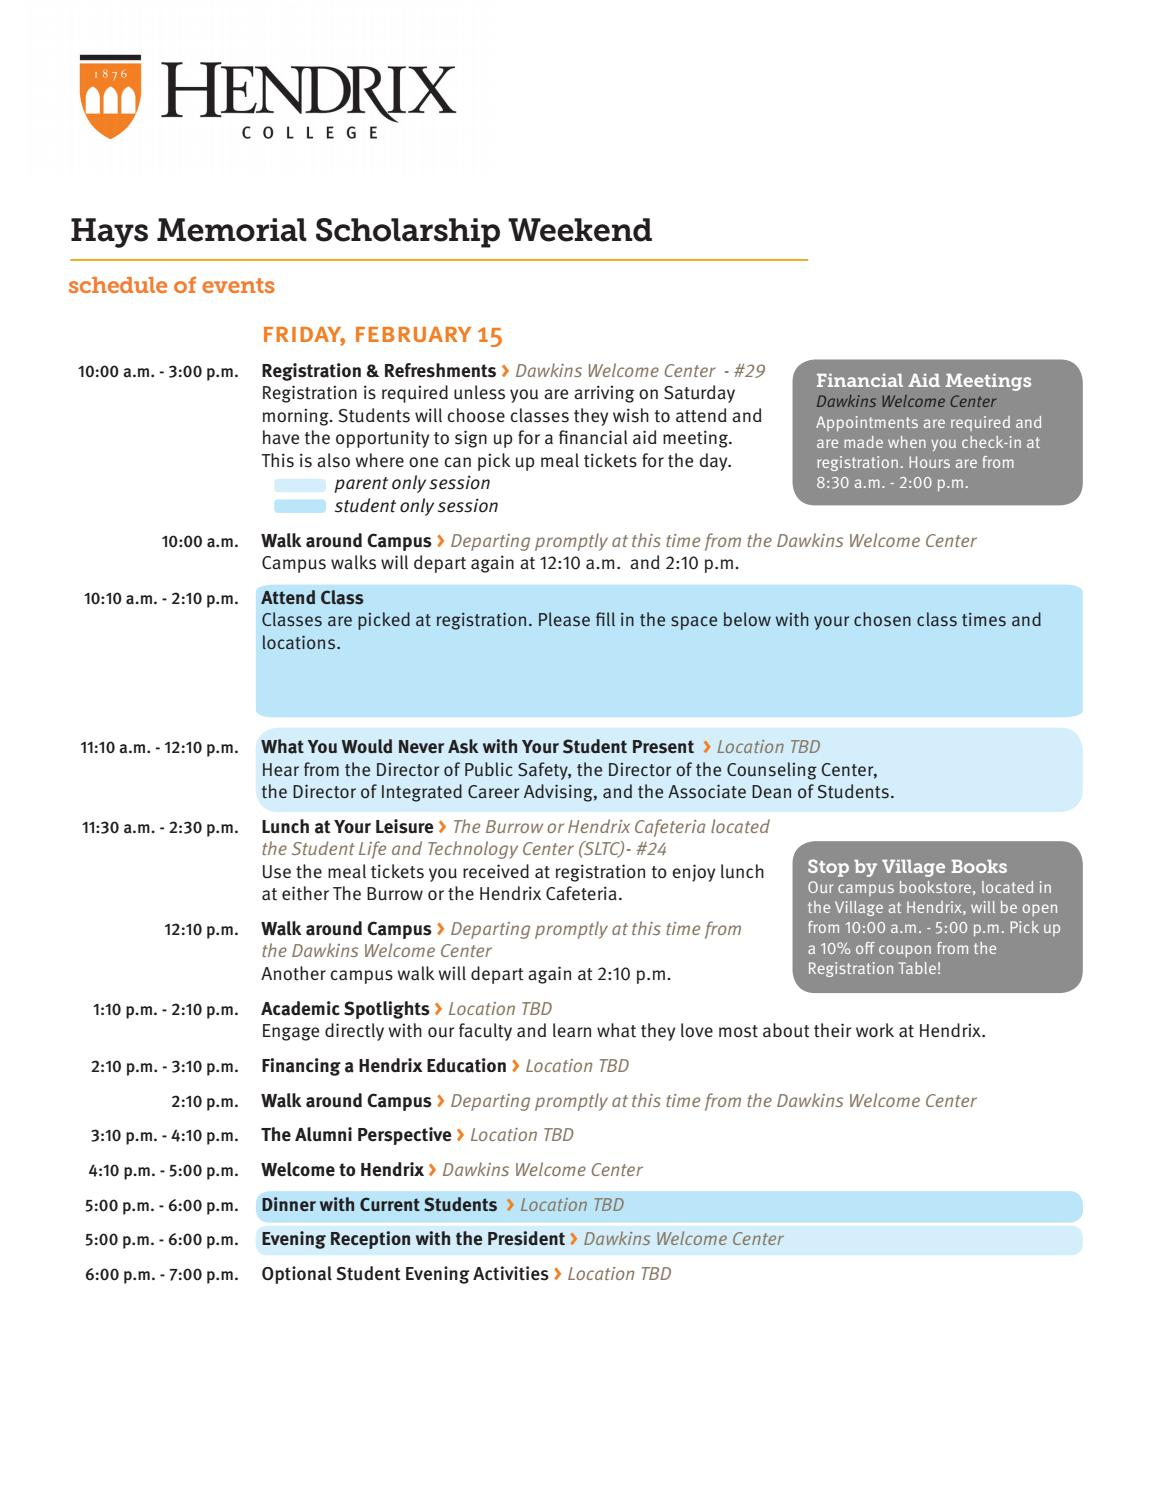 Hays Weekend 2019 Schedule by Hendrix College - issuu